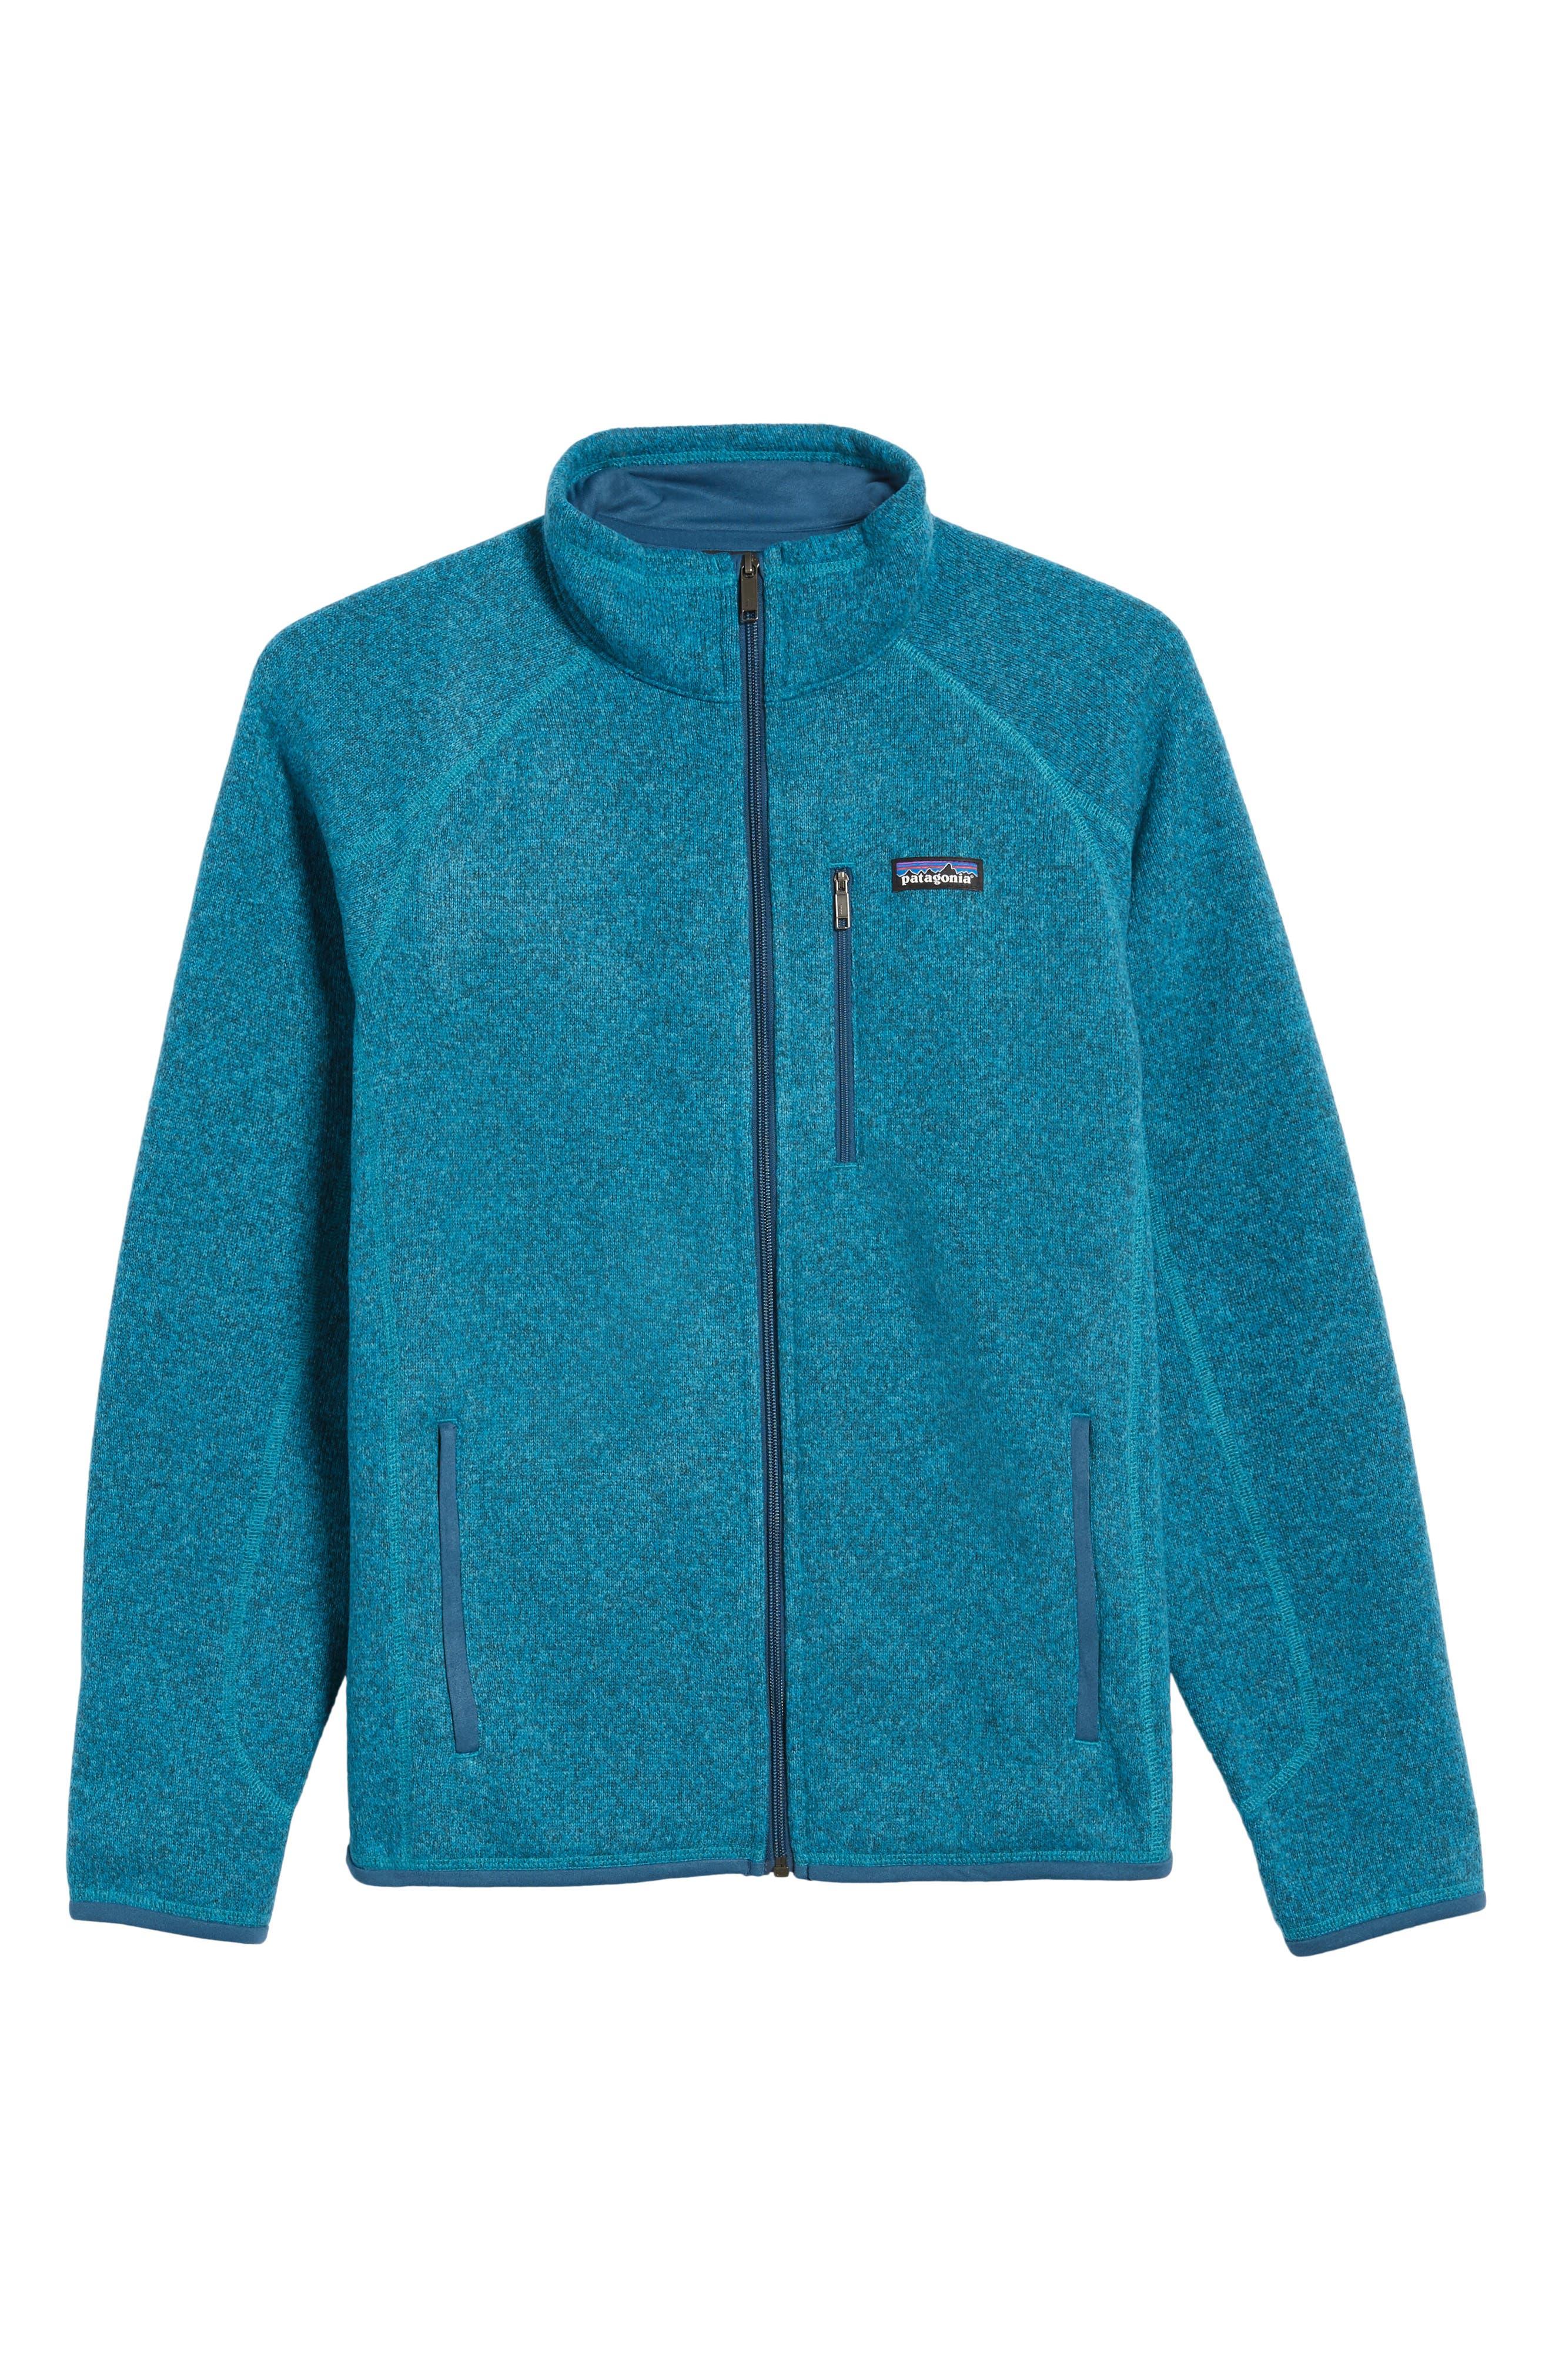 Better Sweater Zip Front Jacket,                             Alternate thumbnail 5, color,                             Filter Blue